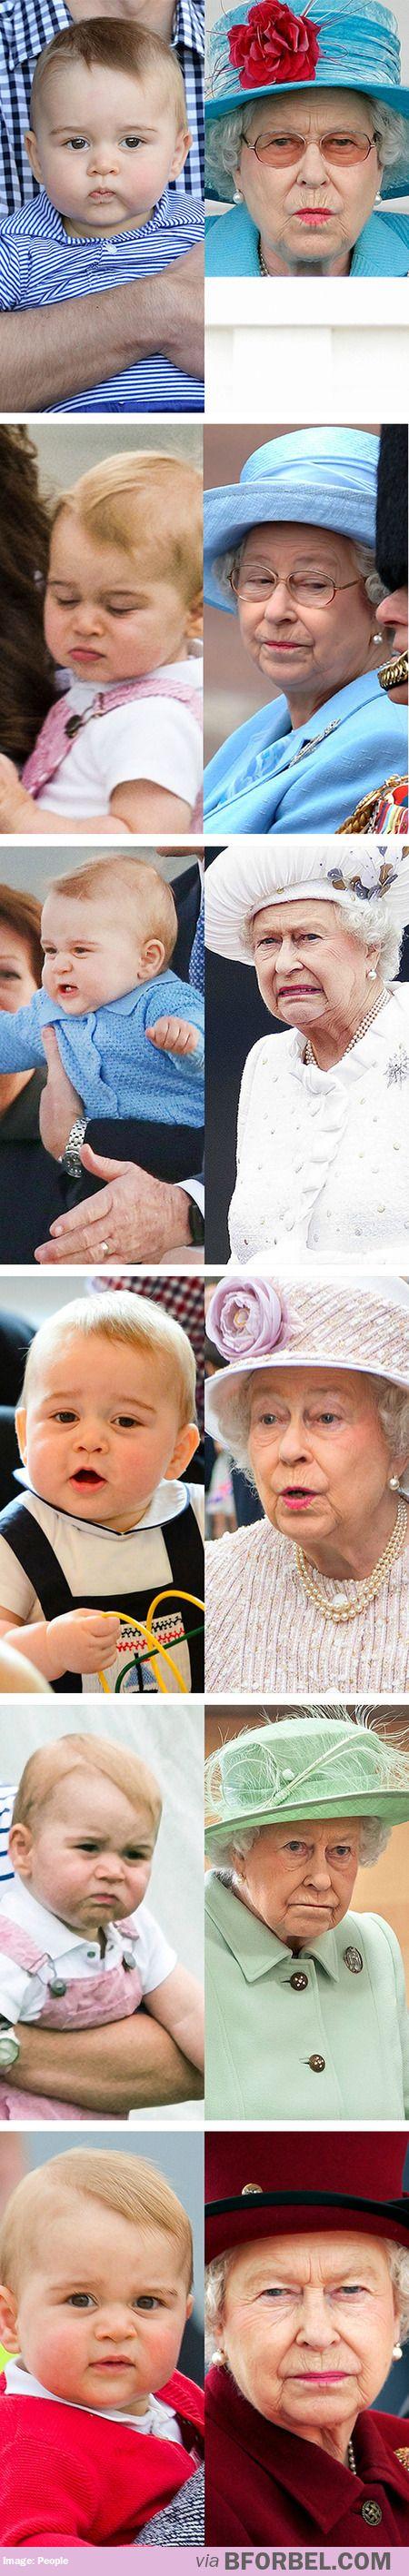 Prince George & great grandmother Queen Elizabeth II ~~ That's hilarious! Love love love it!: